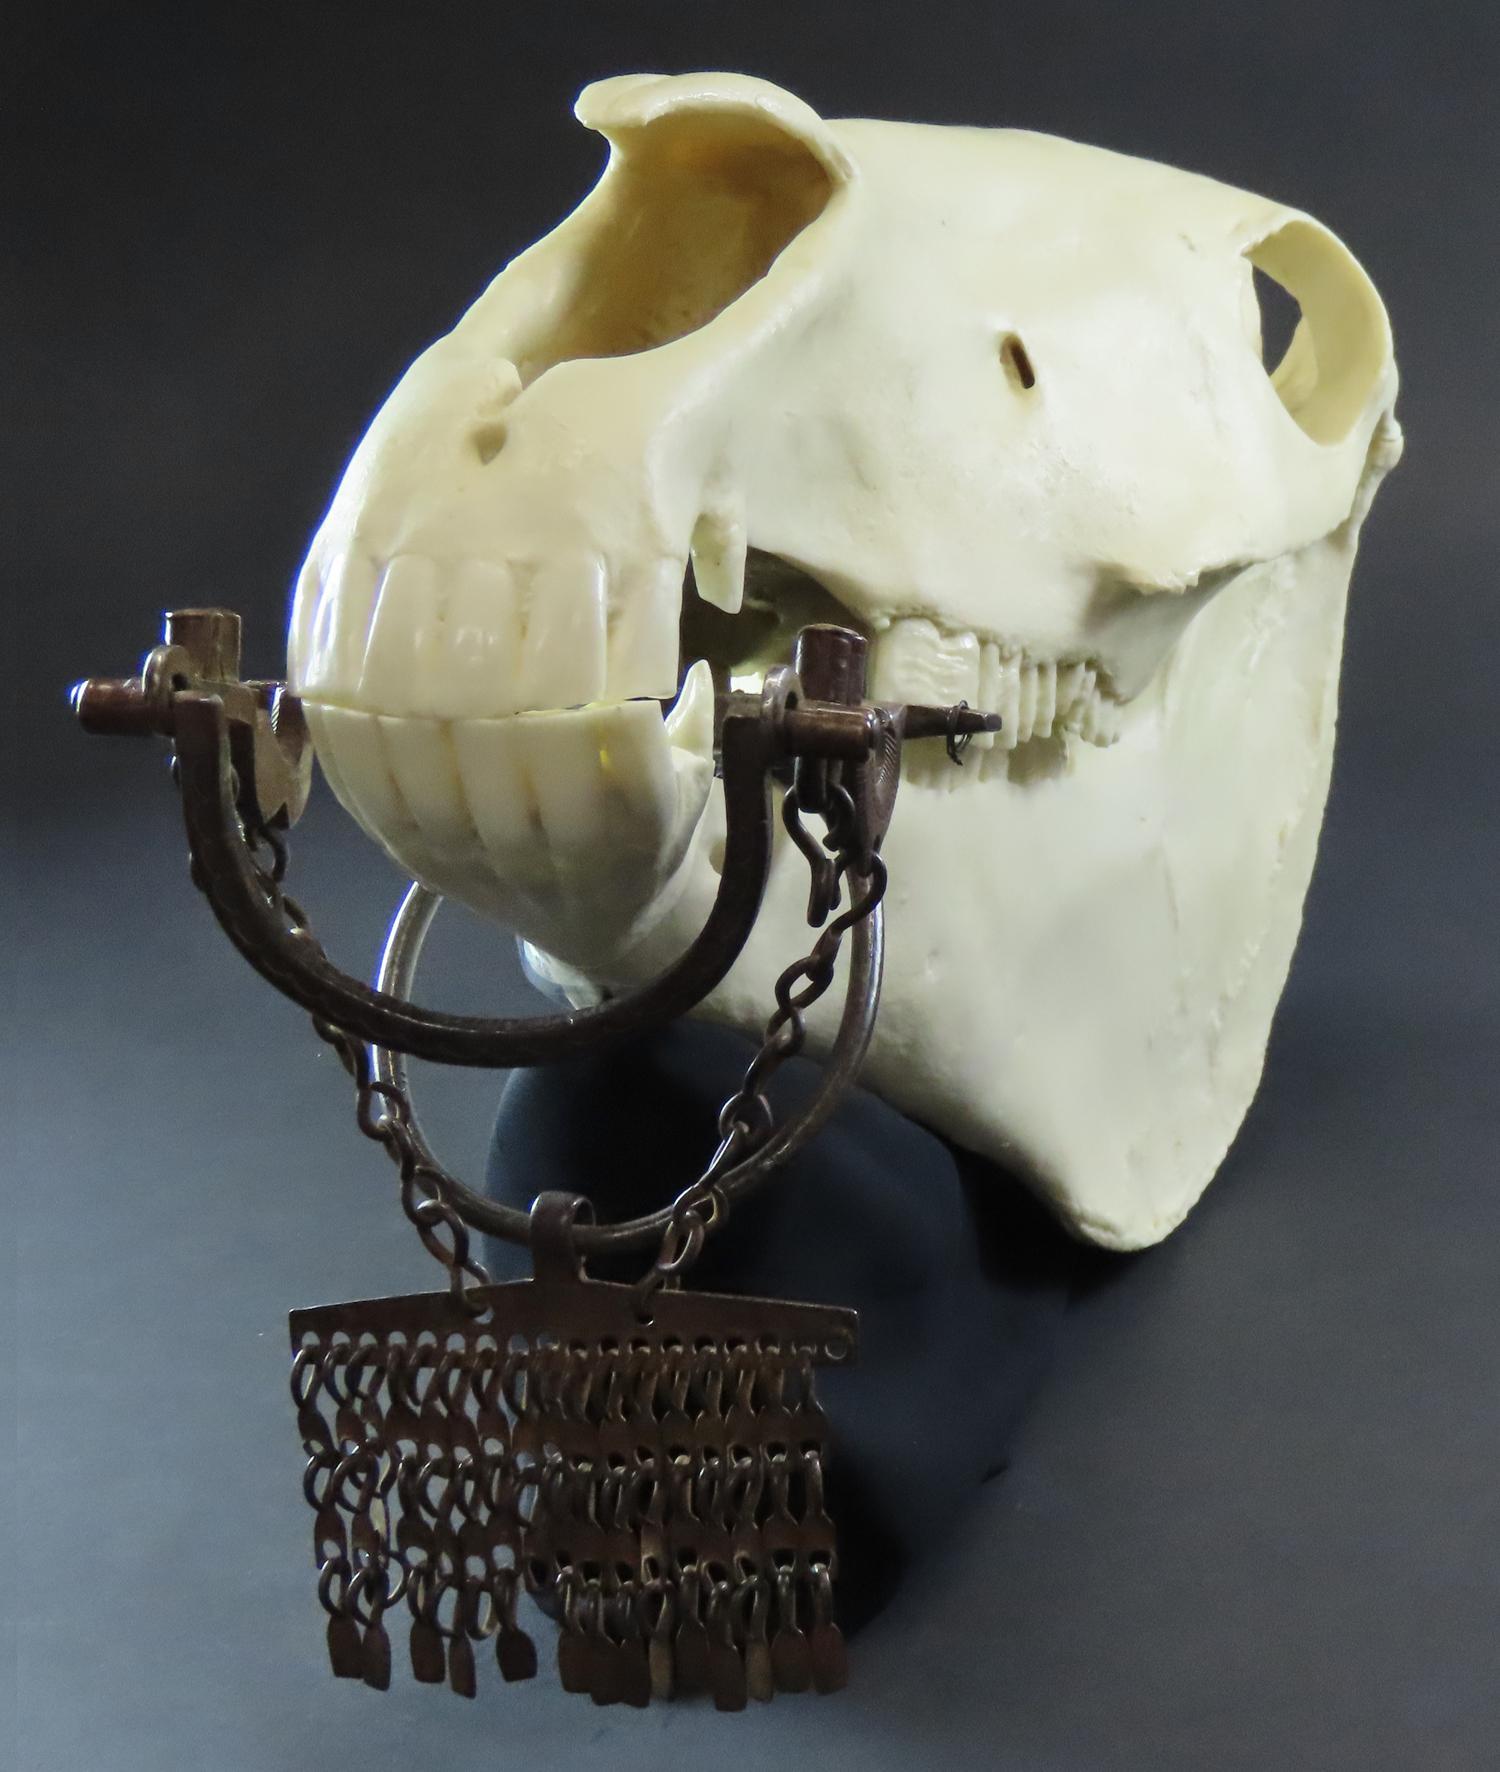 horse skull replica with bit